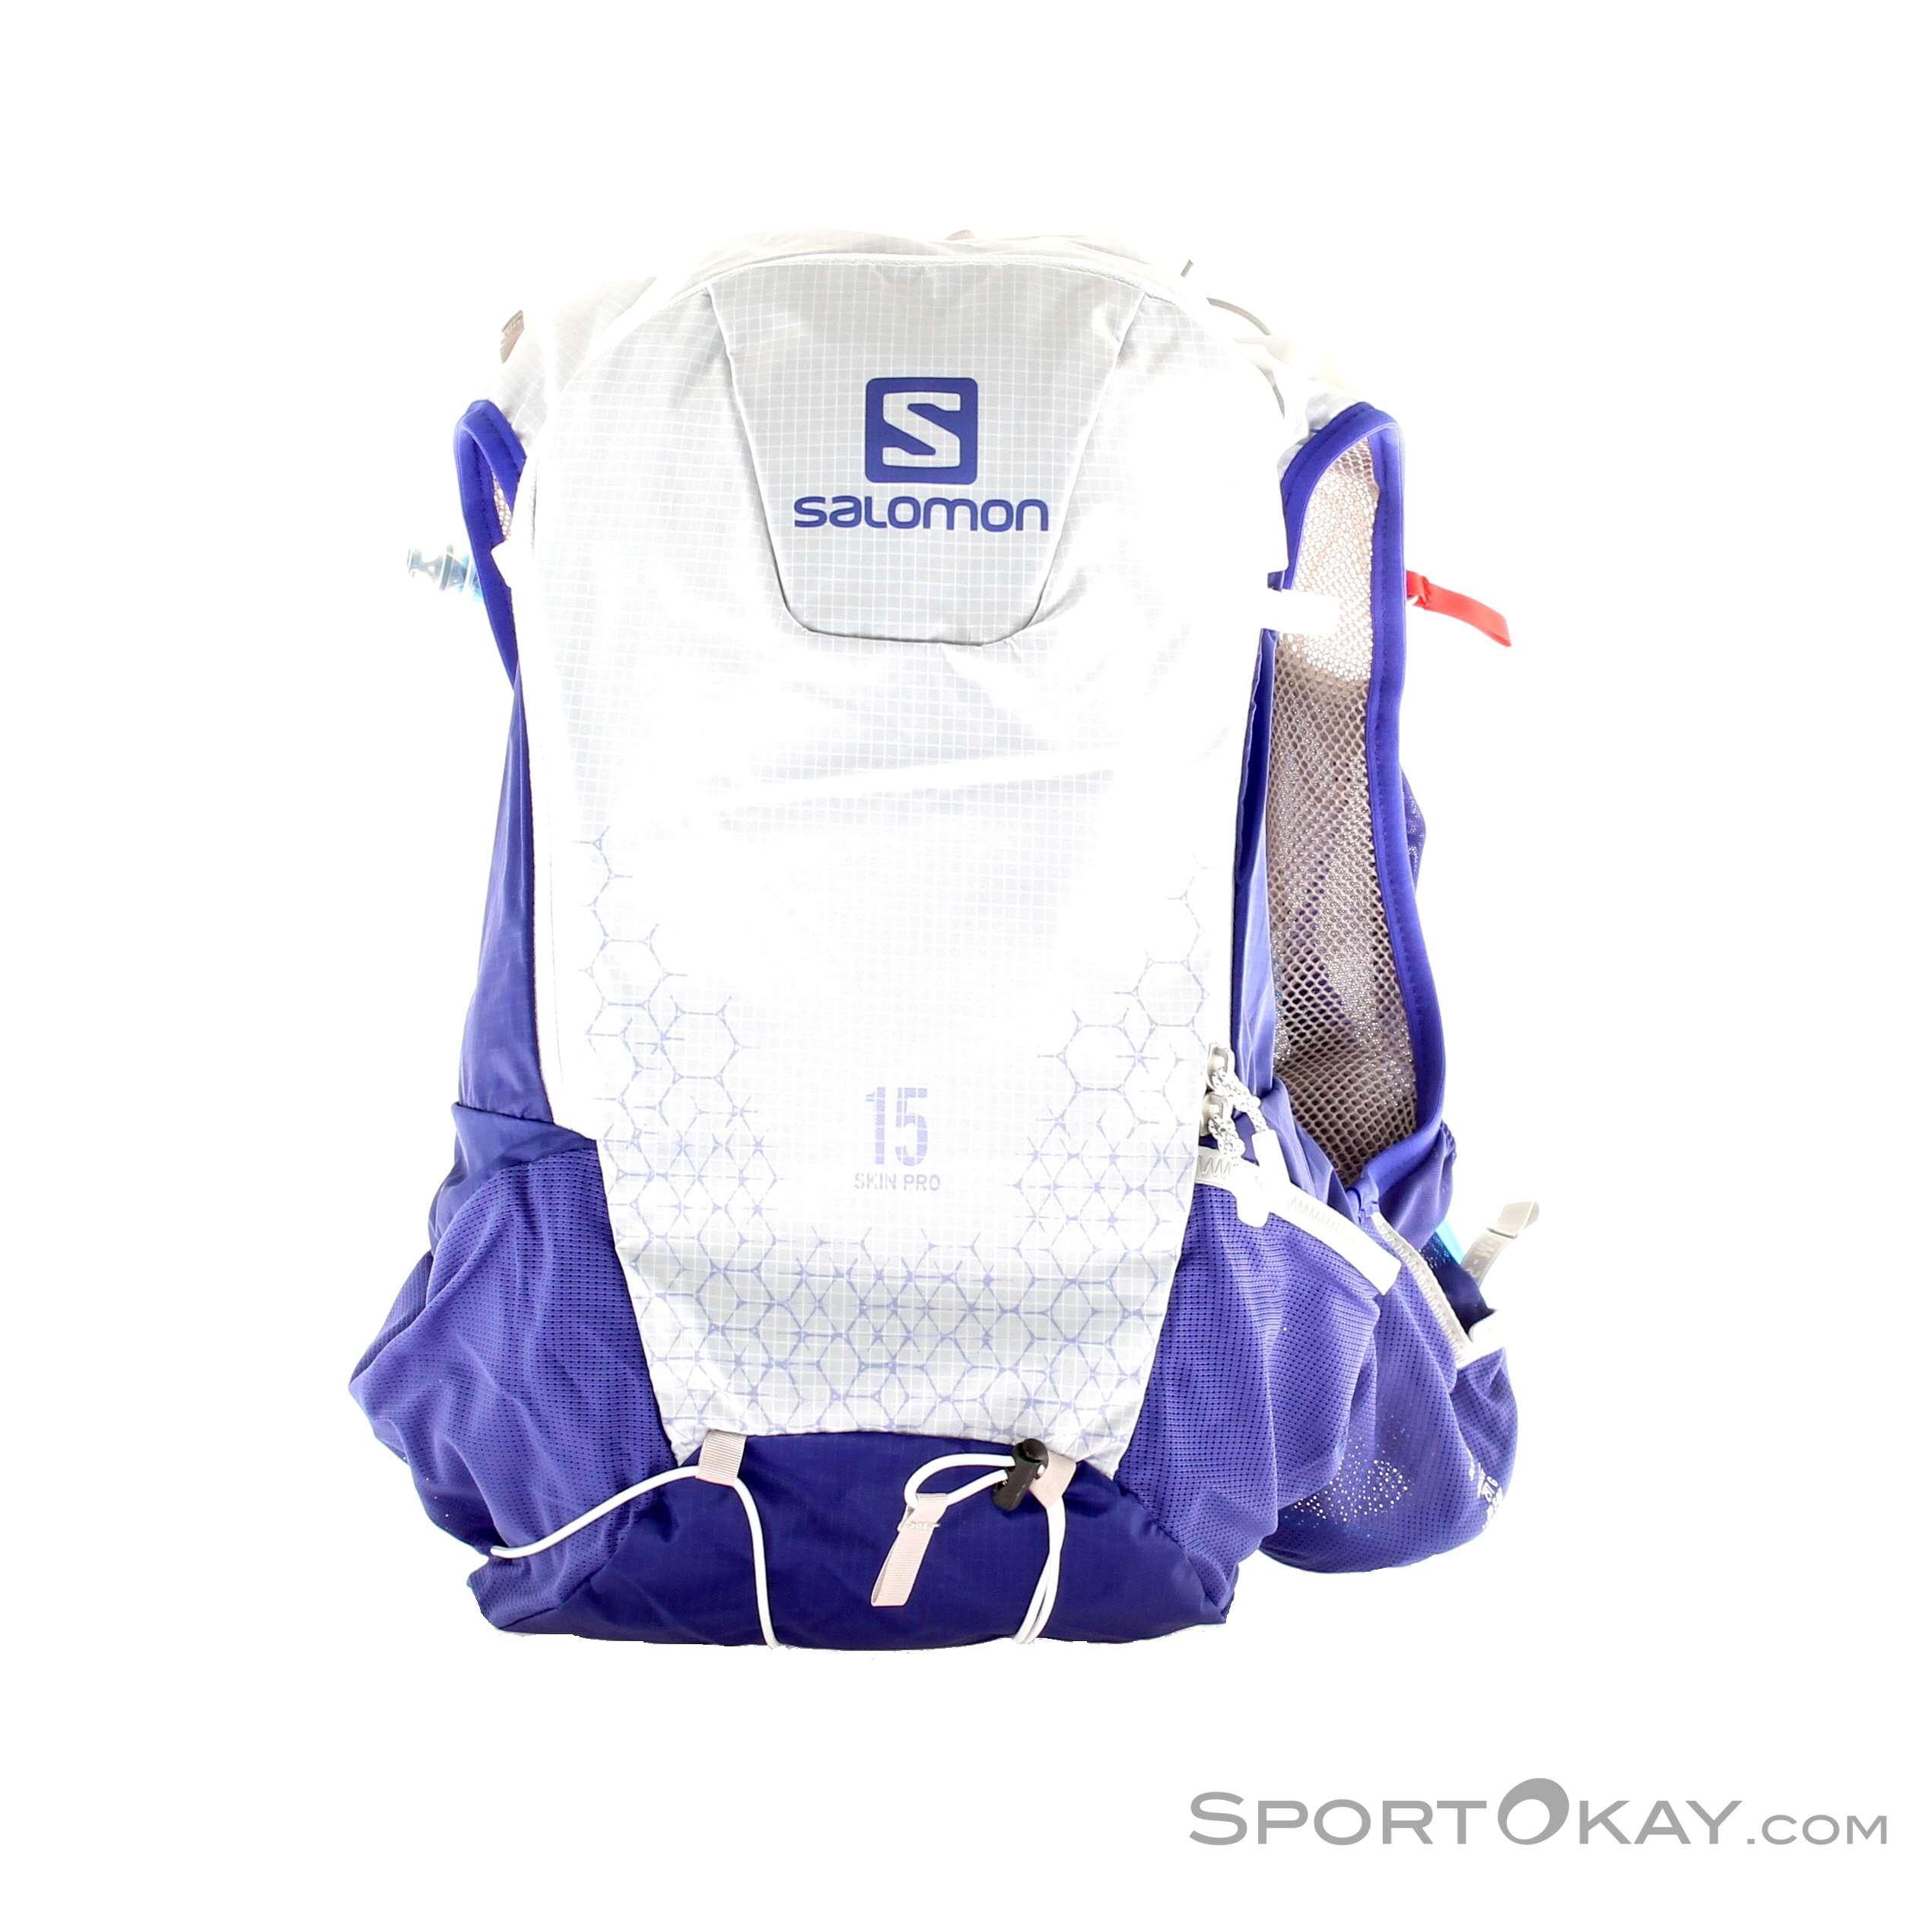 Salomon Skin Pro Set 15l Rucksack, Salomon, Blau, , Herren, 0018-10614, 5637523391, 889645256191, N1-01.jpg